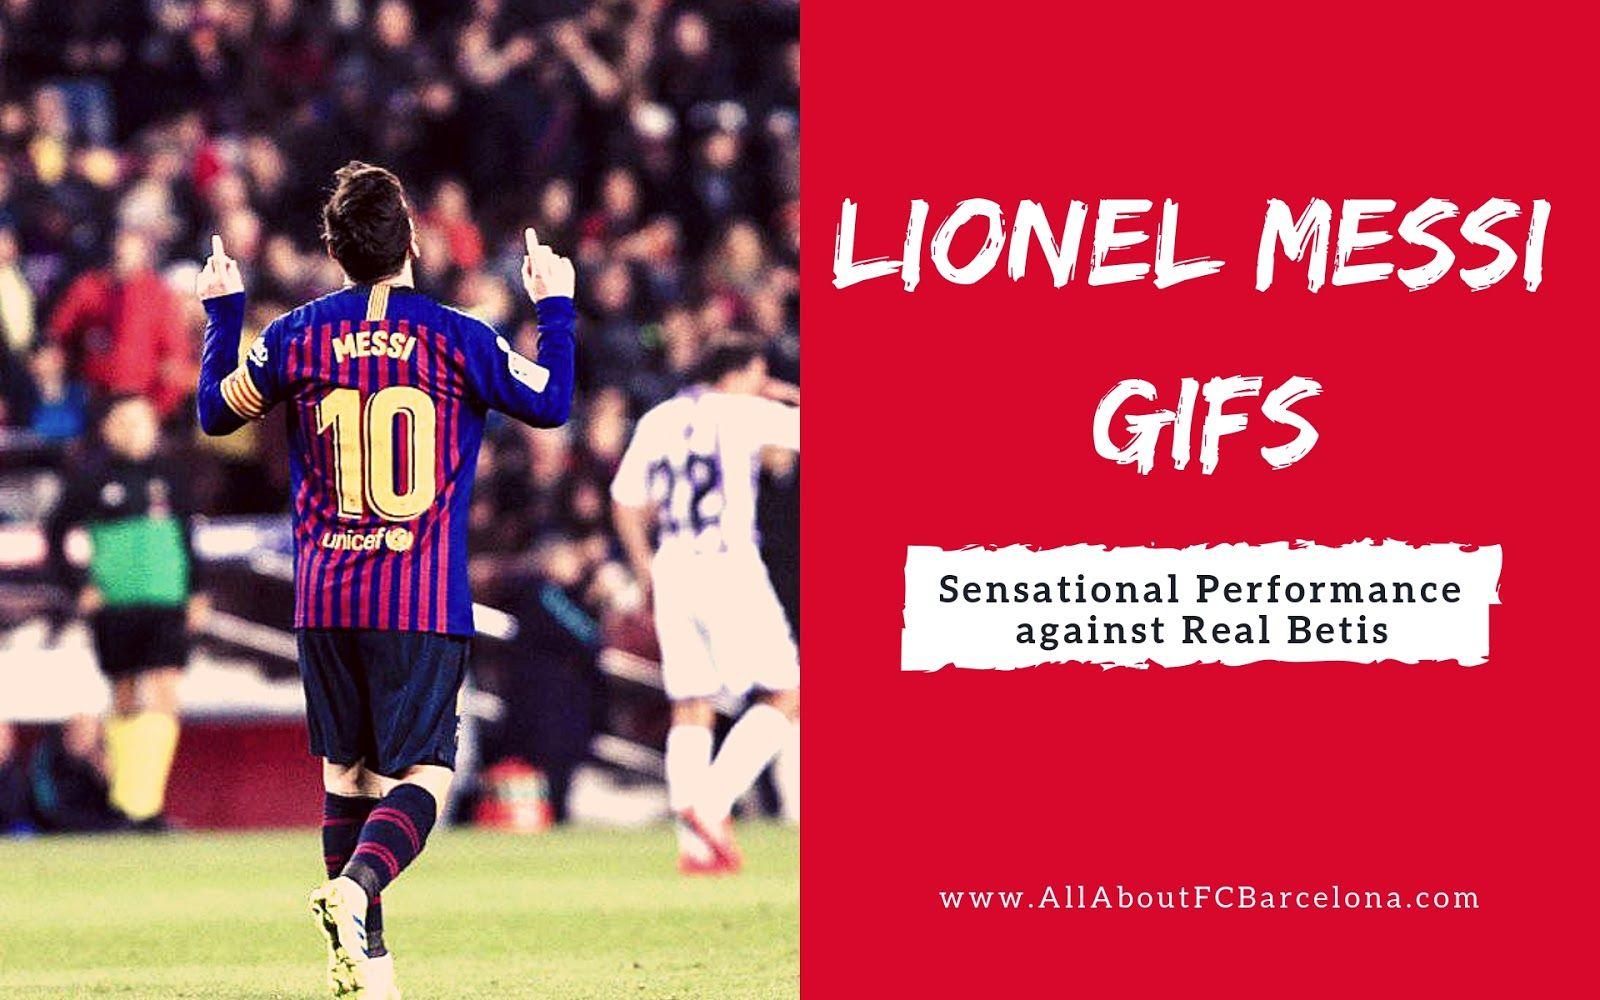 Lionel Messi Wonder Performance Against Real Betis In Gif Photos Lionel Messi Messi Lionel